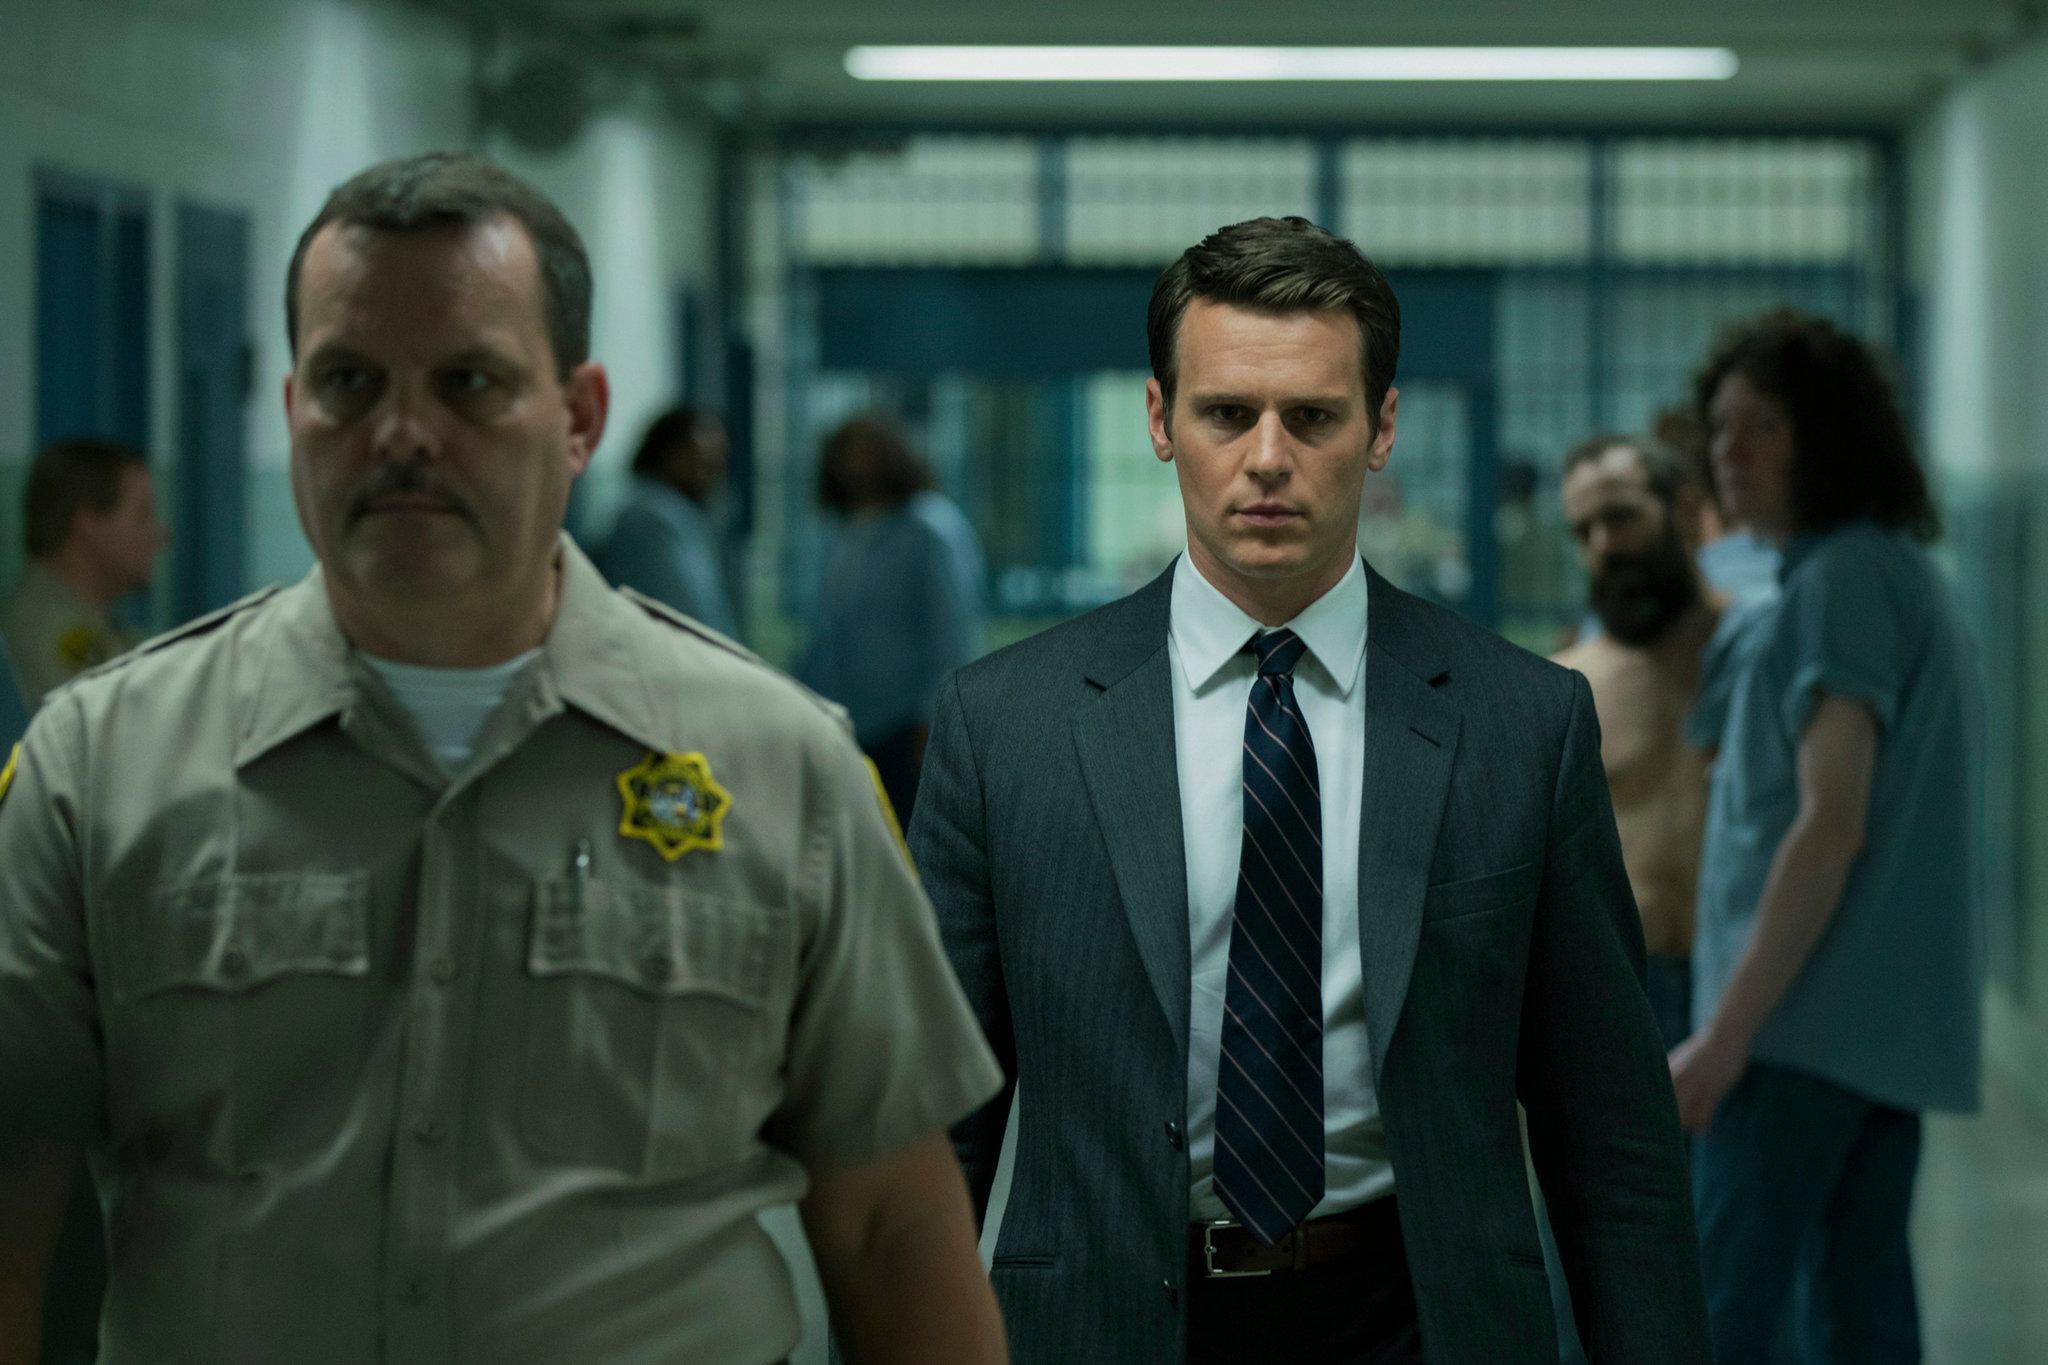 Confirmado: Netflix le pone pausa indefinida a Mindhunter - Radio Cantilo